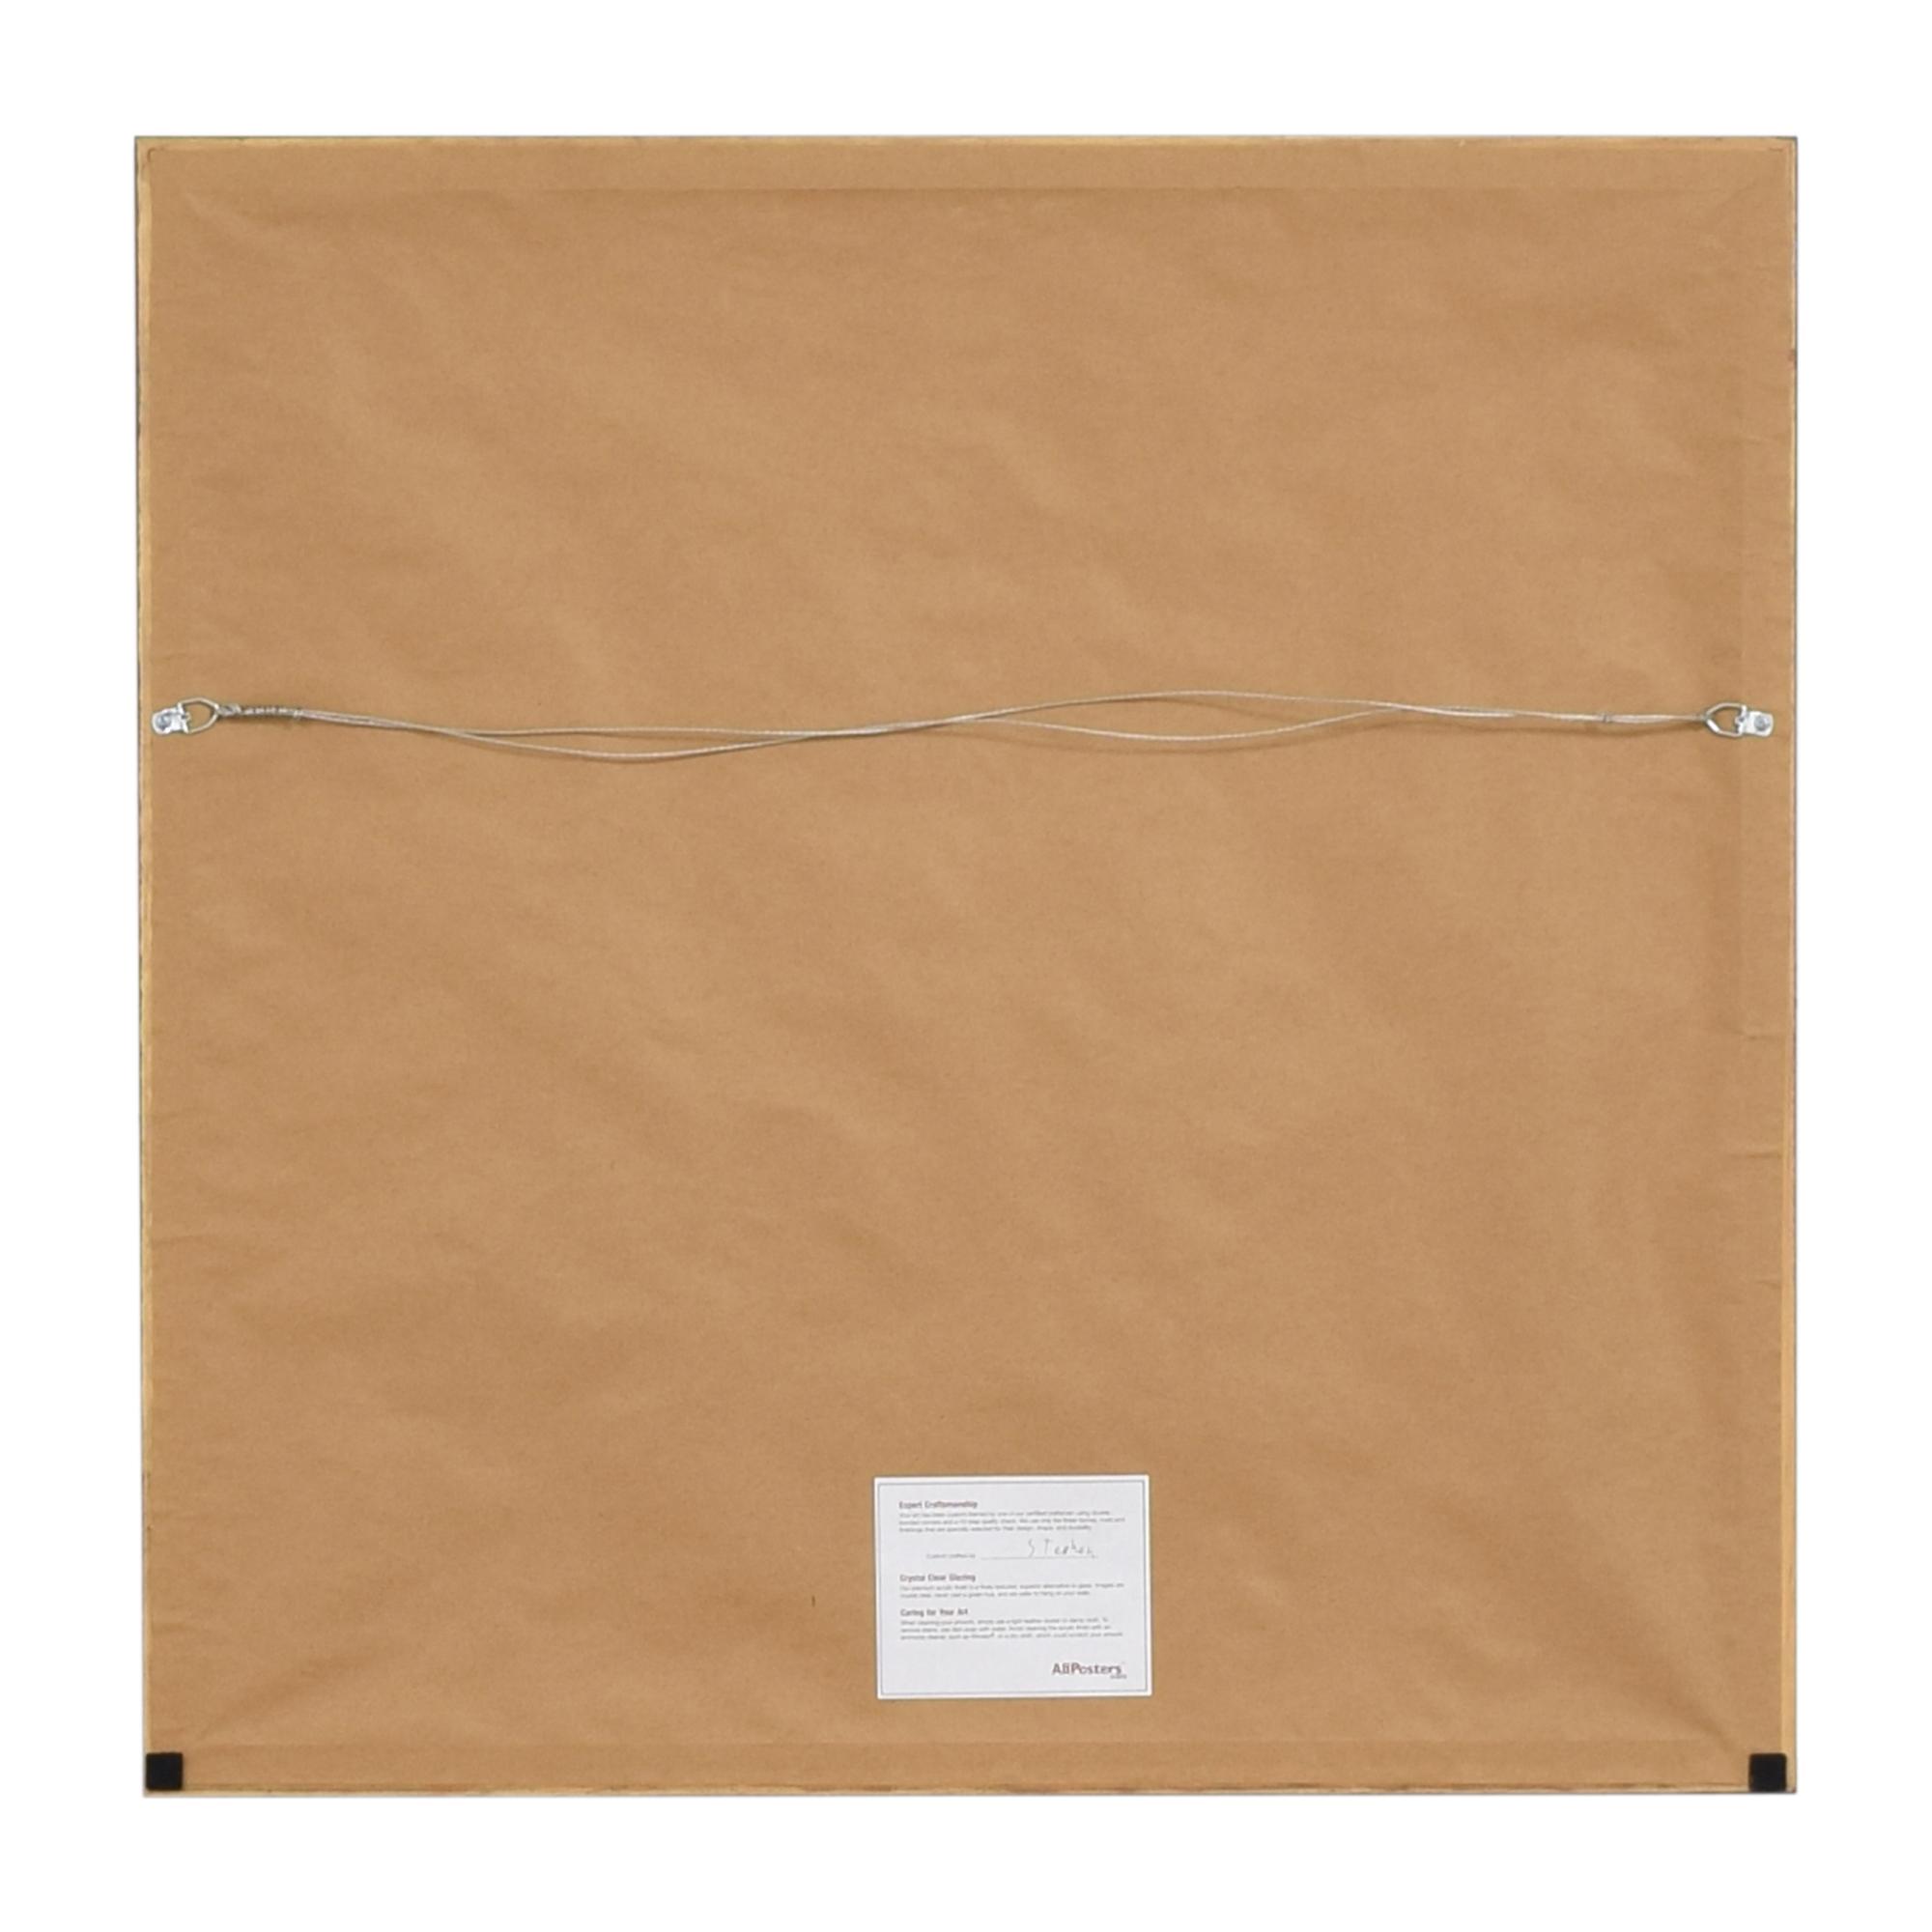 Philip Guston Framed Wall Art dimensions